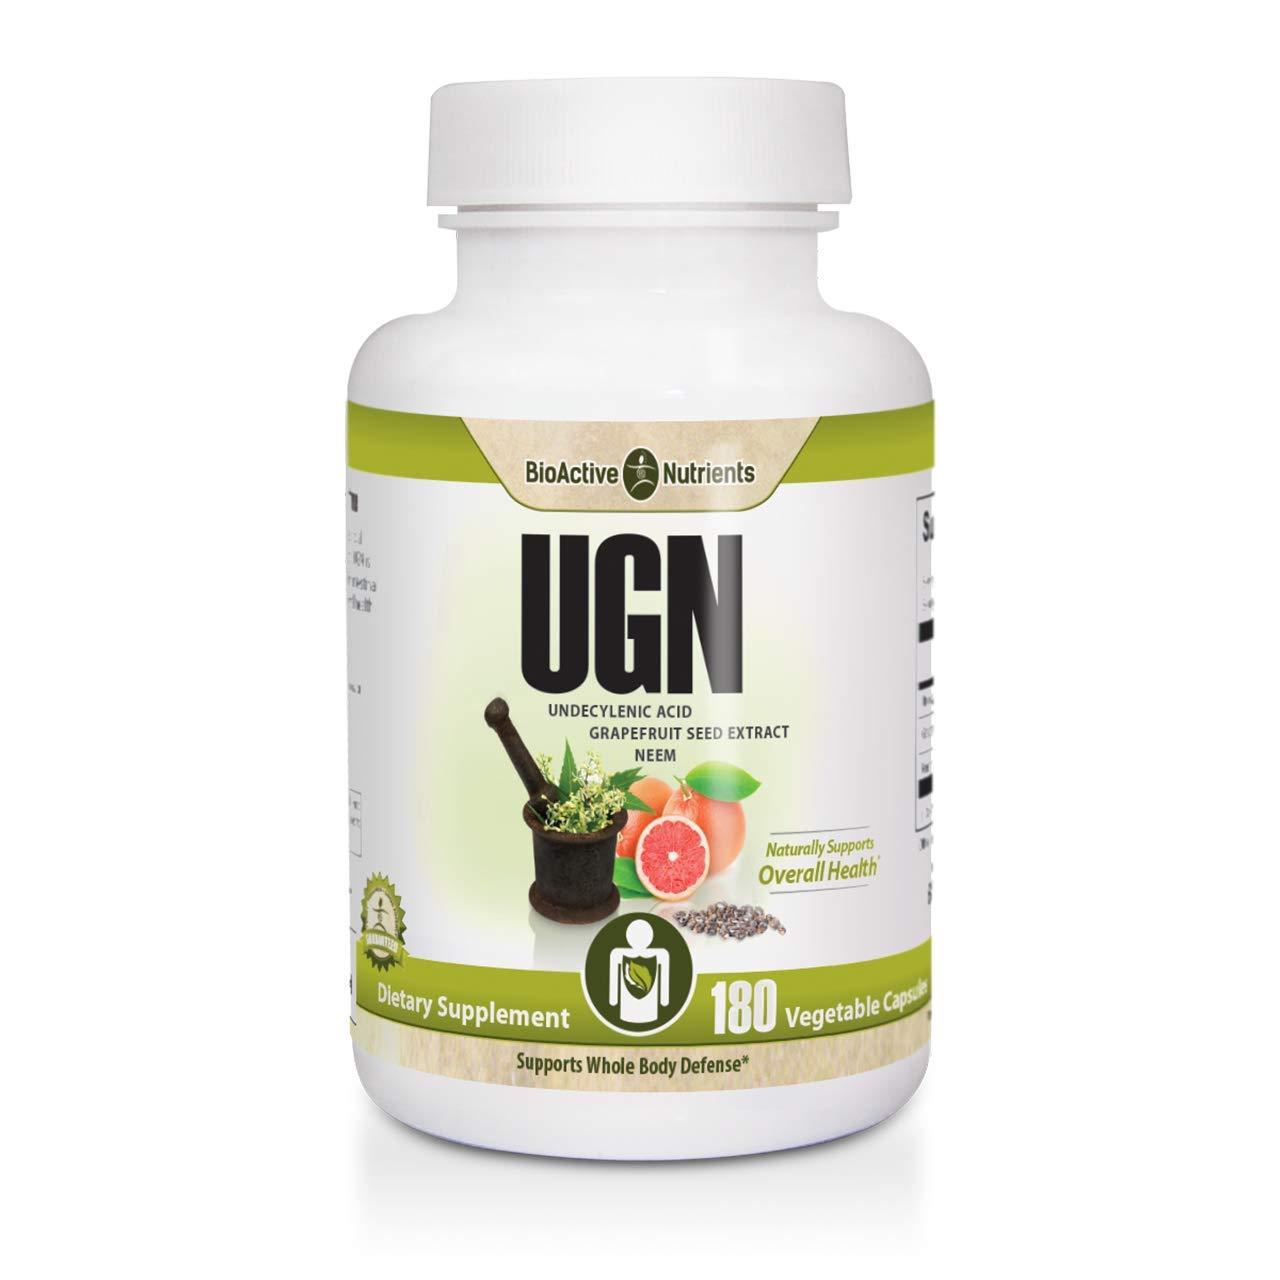 UGN - Undecylenic Acid | Grapefruit Seed Extract | Neem 180 Vegetable Capsules